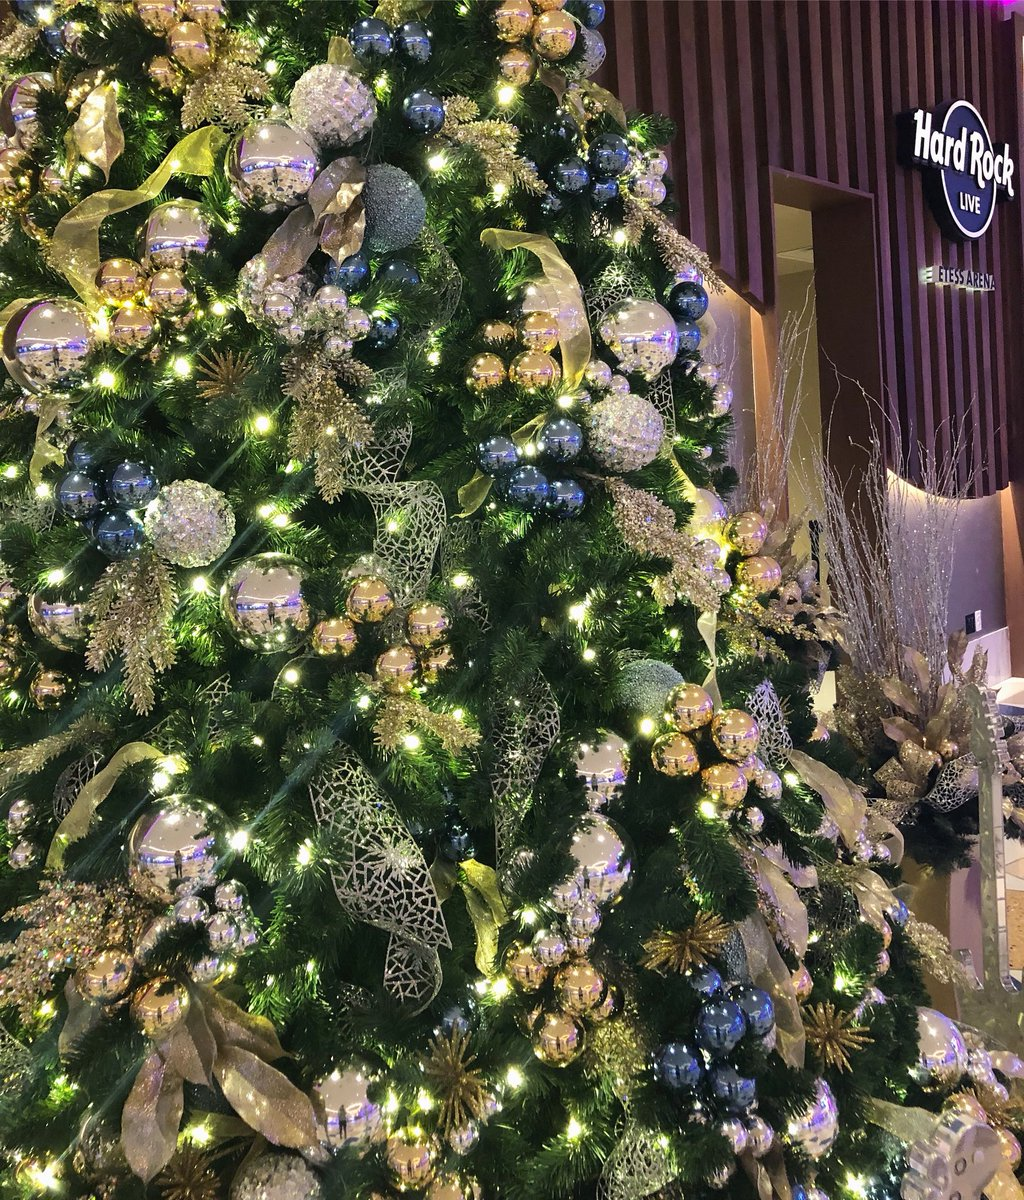 Rock Around The Christmas Tree.Hard Rock Atlantic City On Twitter Hard Rockin Around The